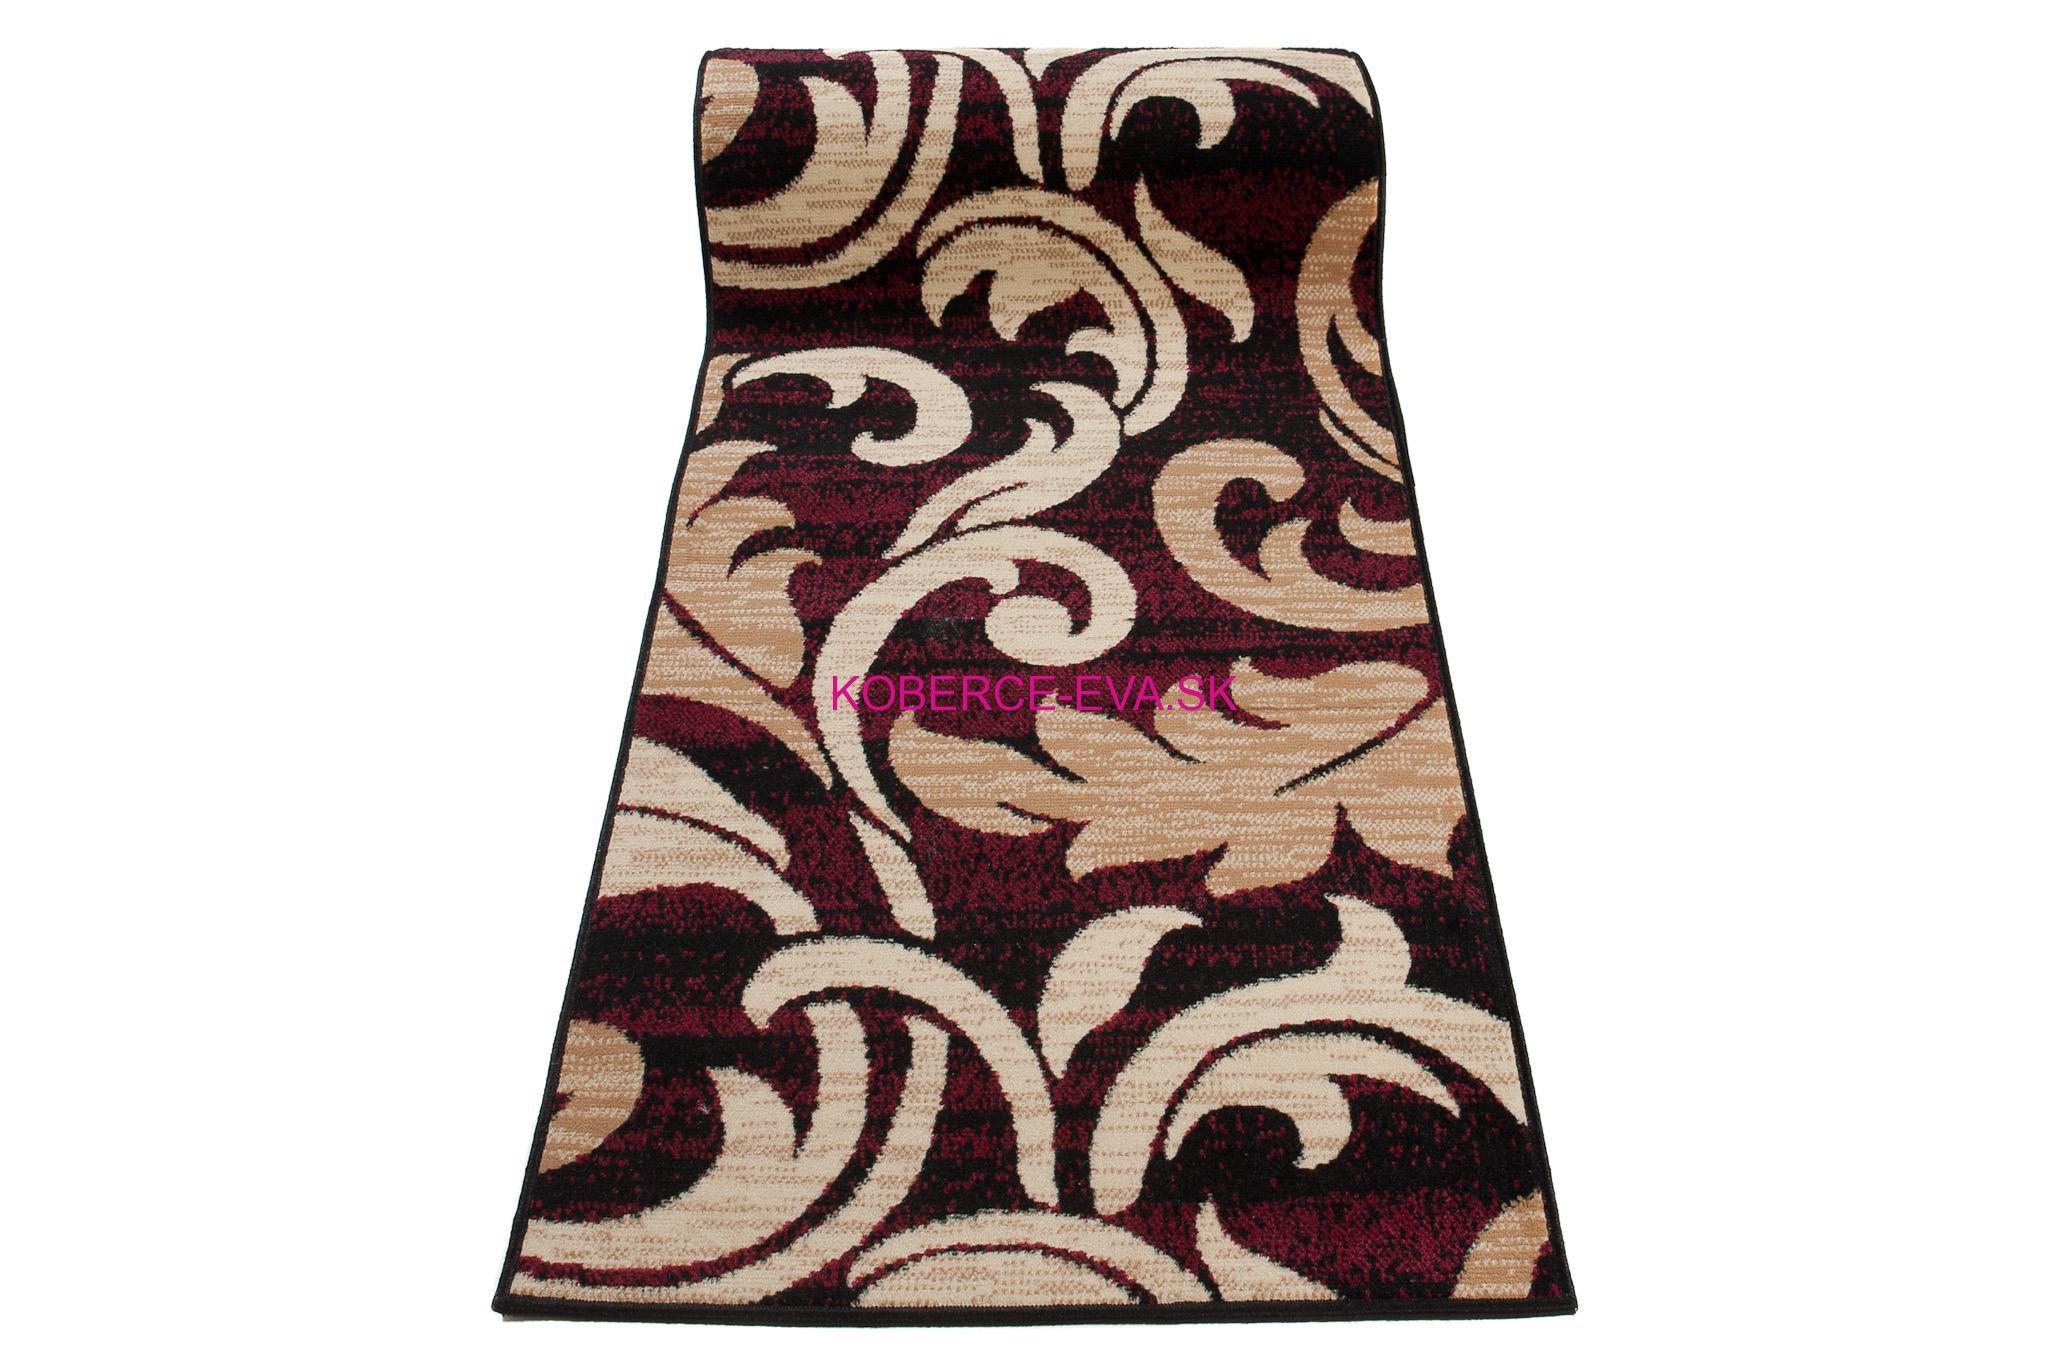 474964121 Behúň koberec BCF 2715B | E-SHOP koberce Eva